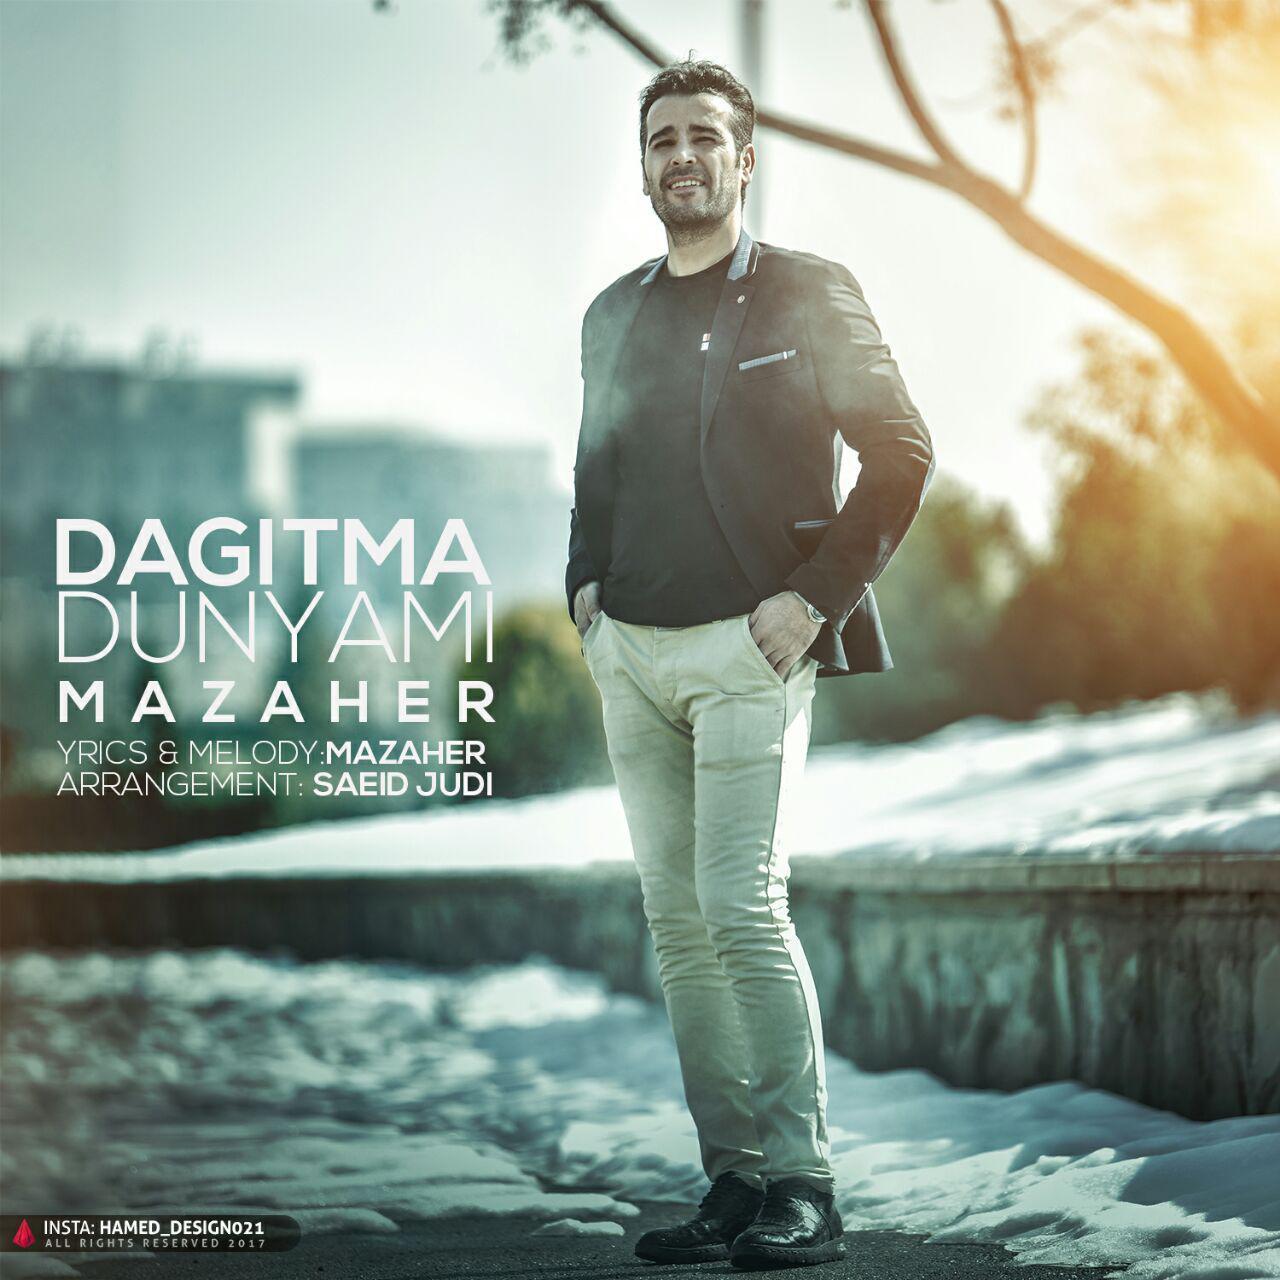 http://s8.picofile.com/file/8322441242/23Mazaher_Dagitma_Dunyami.jpg